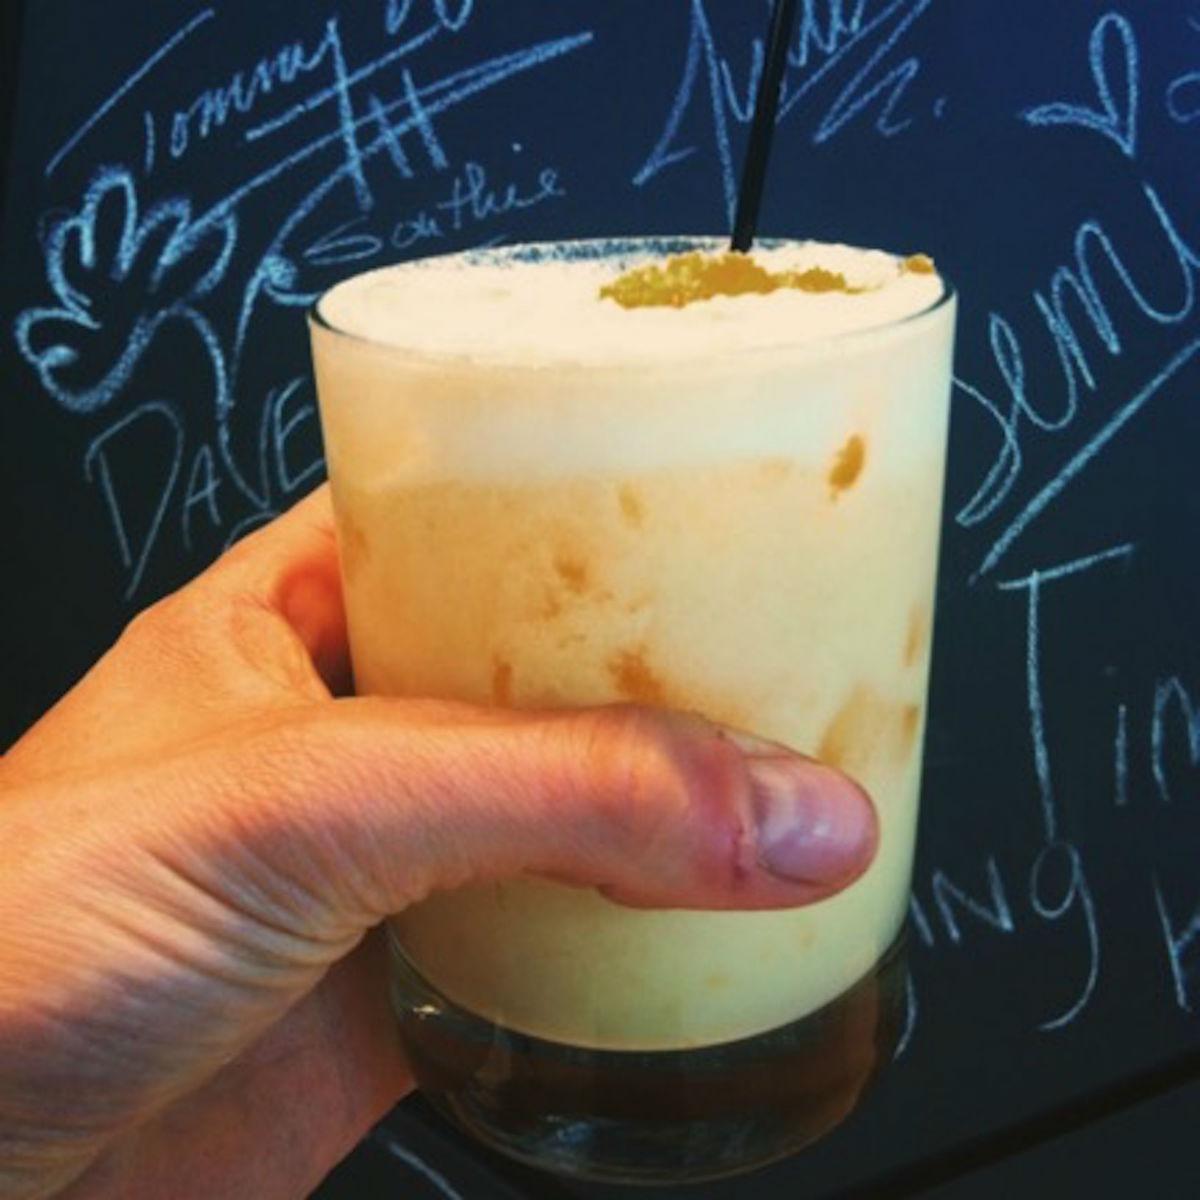 Orange Creamsicle at Cafe ArtScience